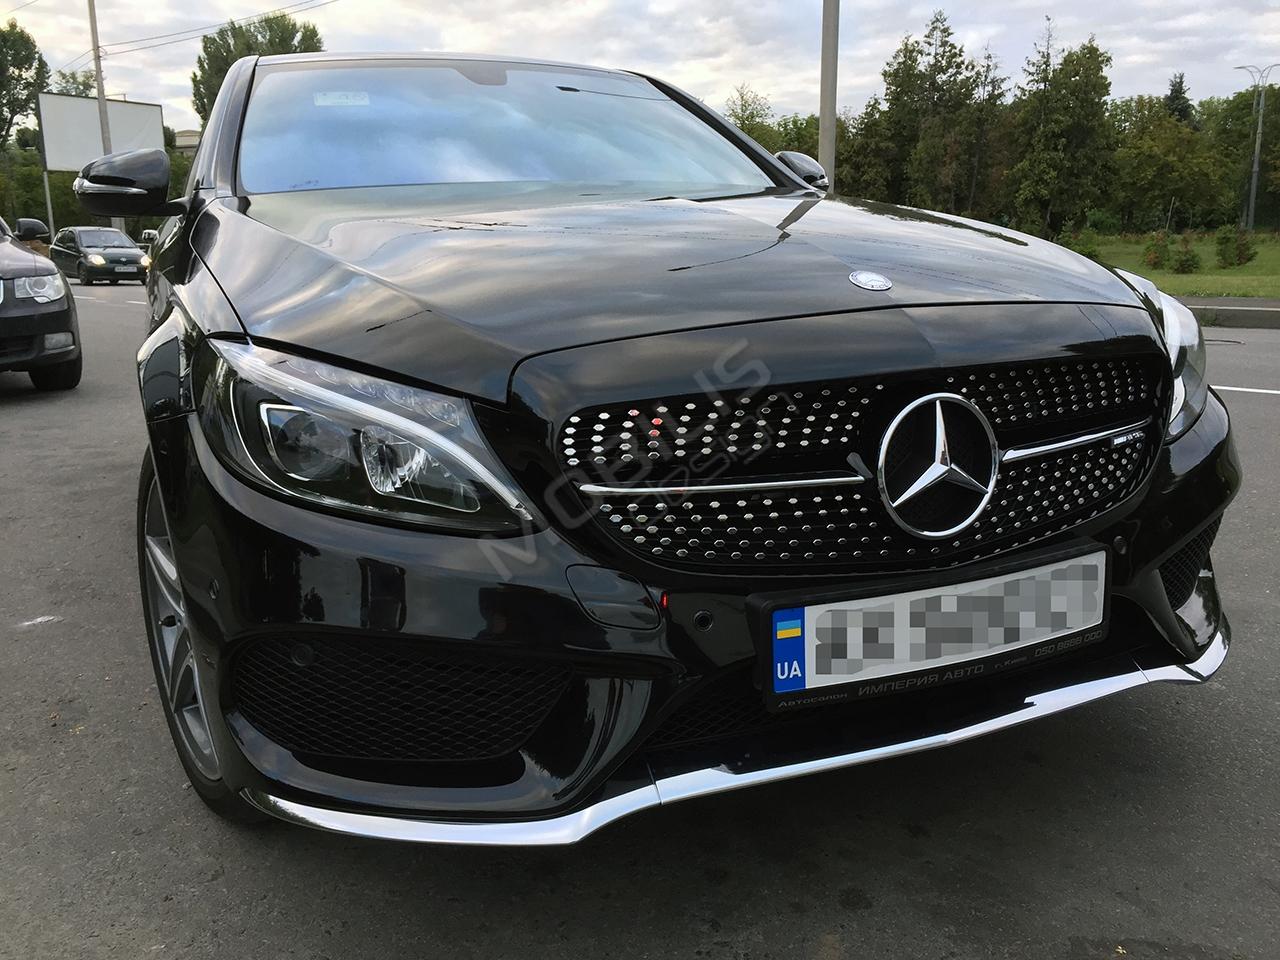 Mercedes-Benz C 250 2016 - установка решетки, спойлера, диффузора и насадок